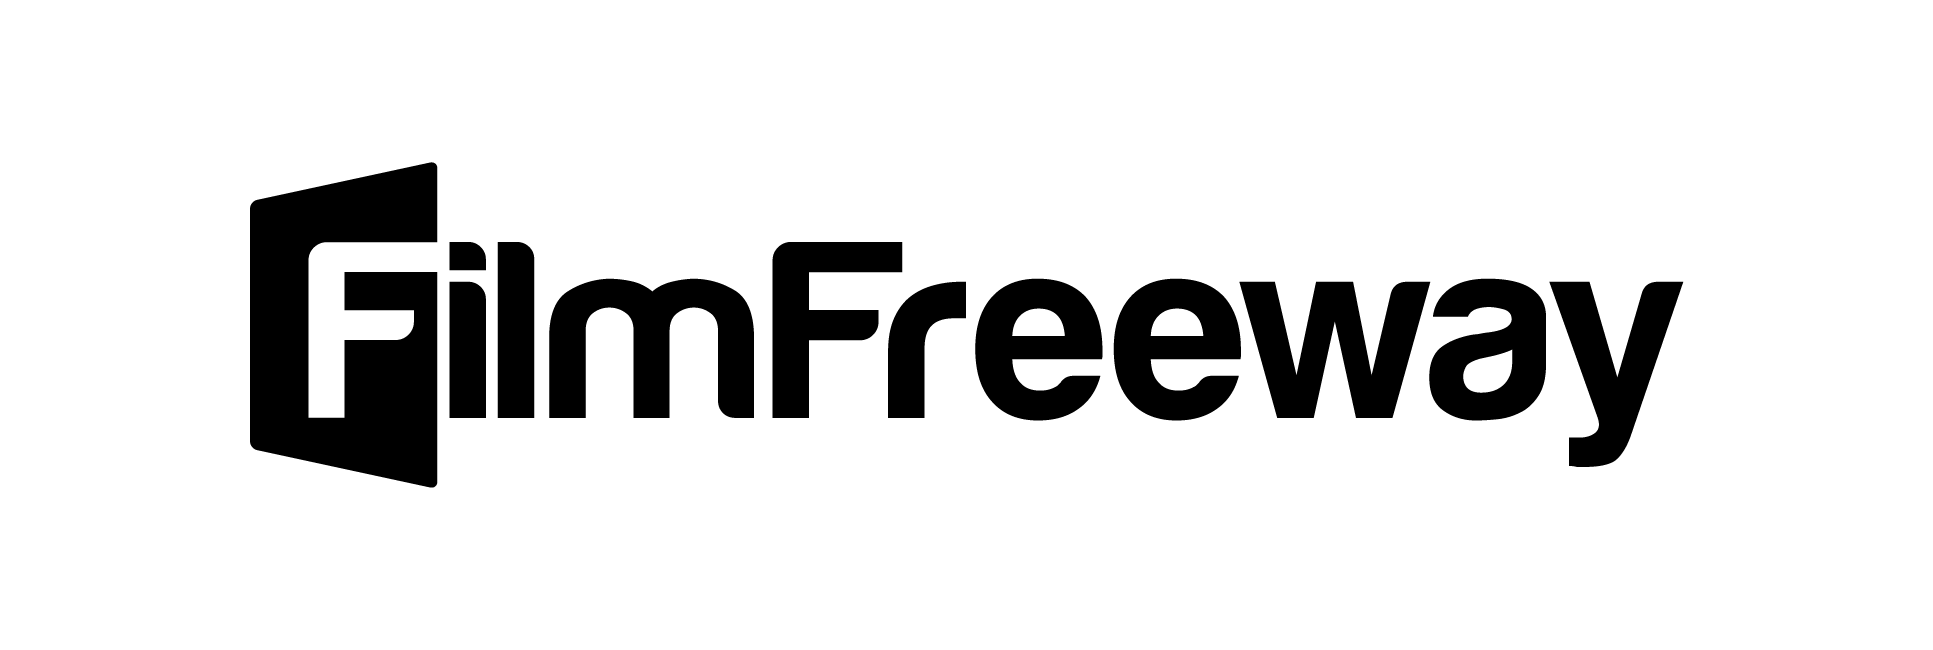 filmfreeway logo.png